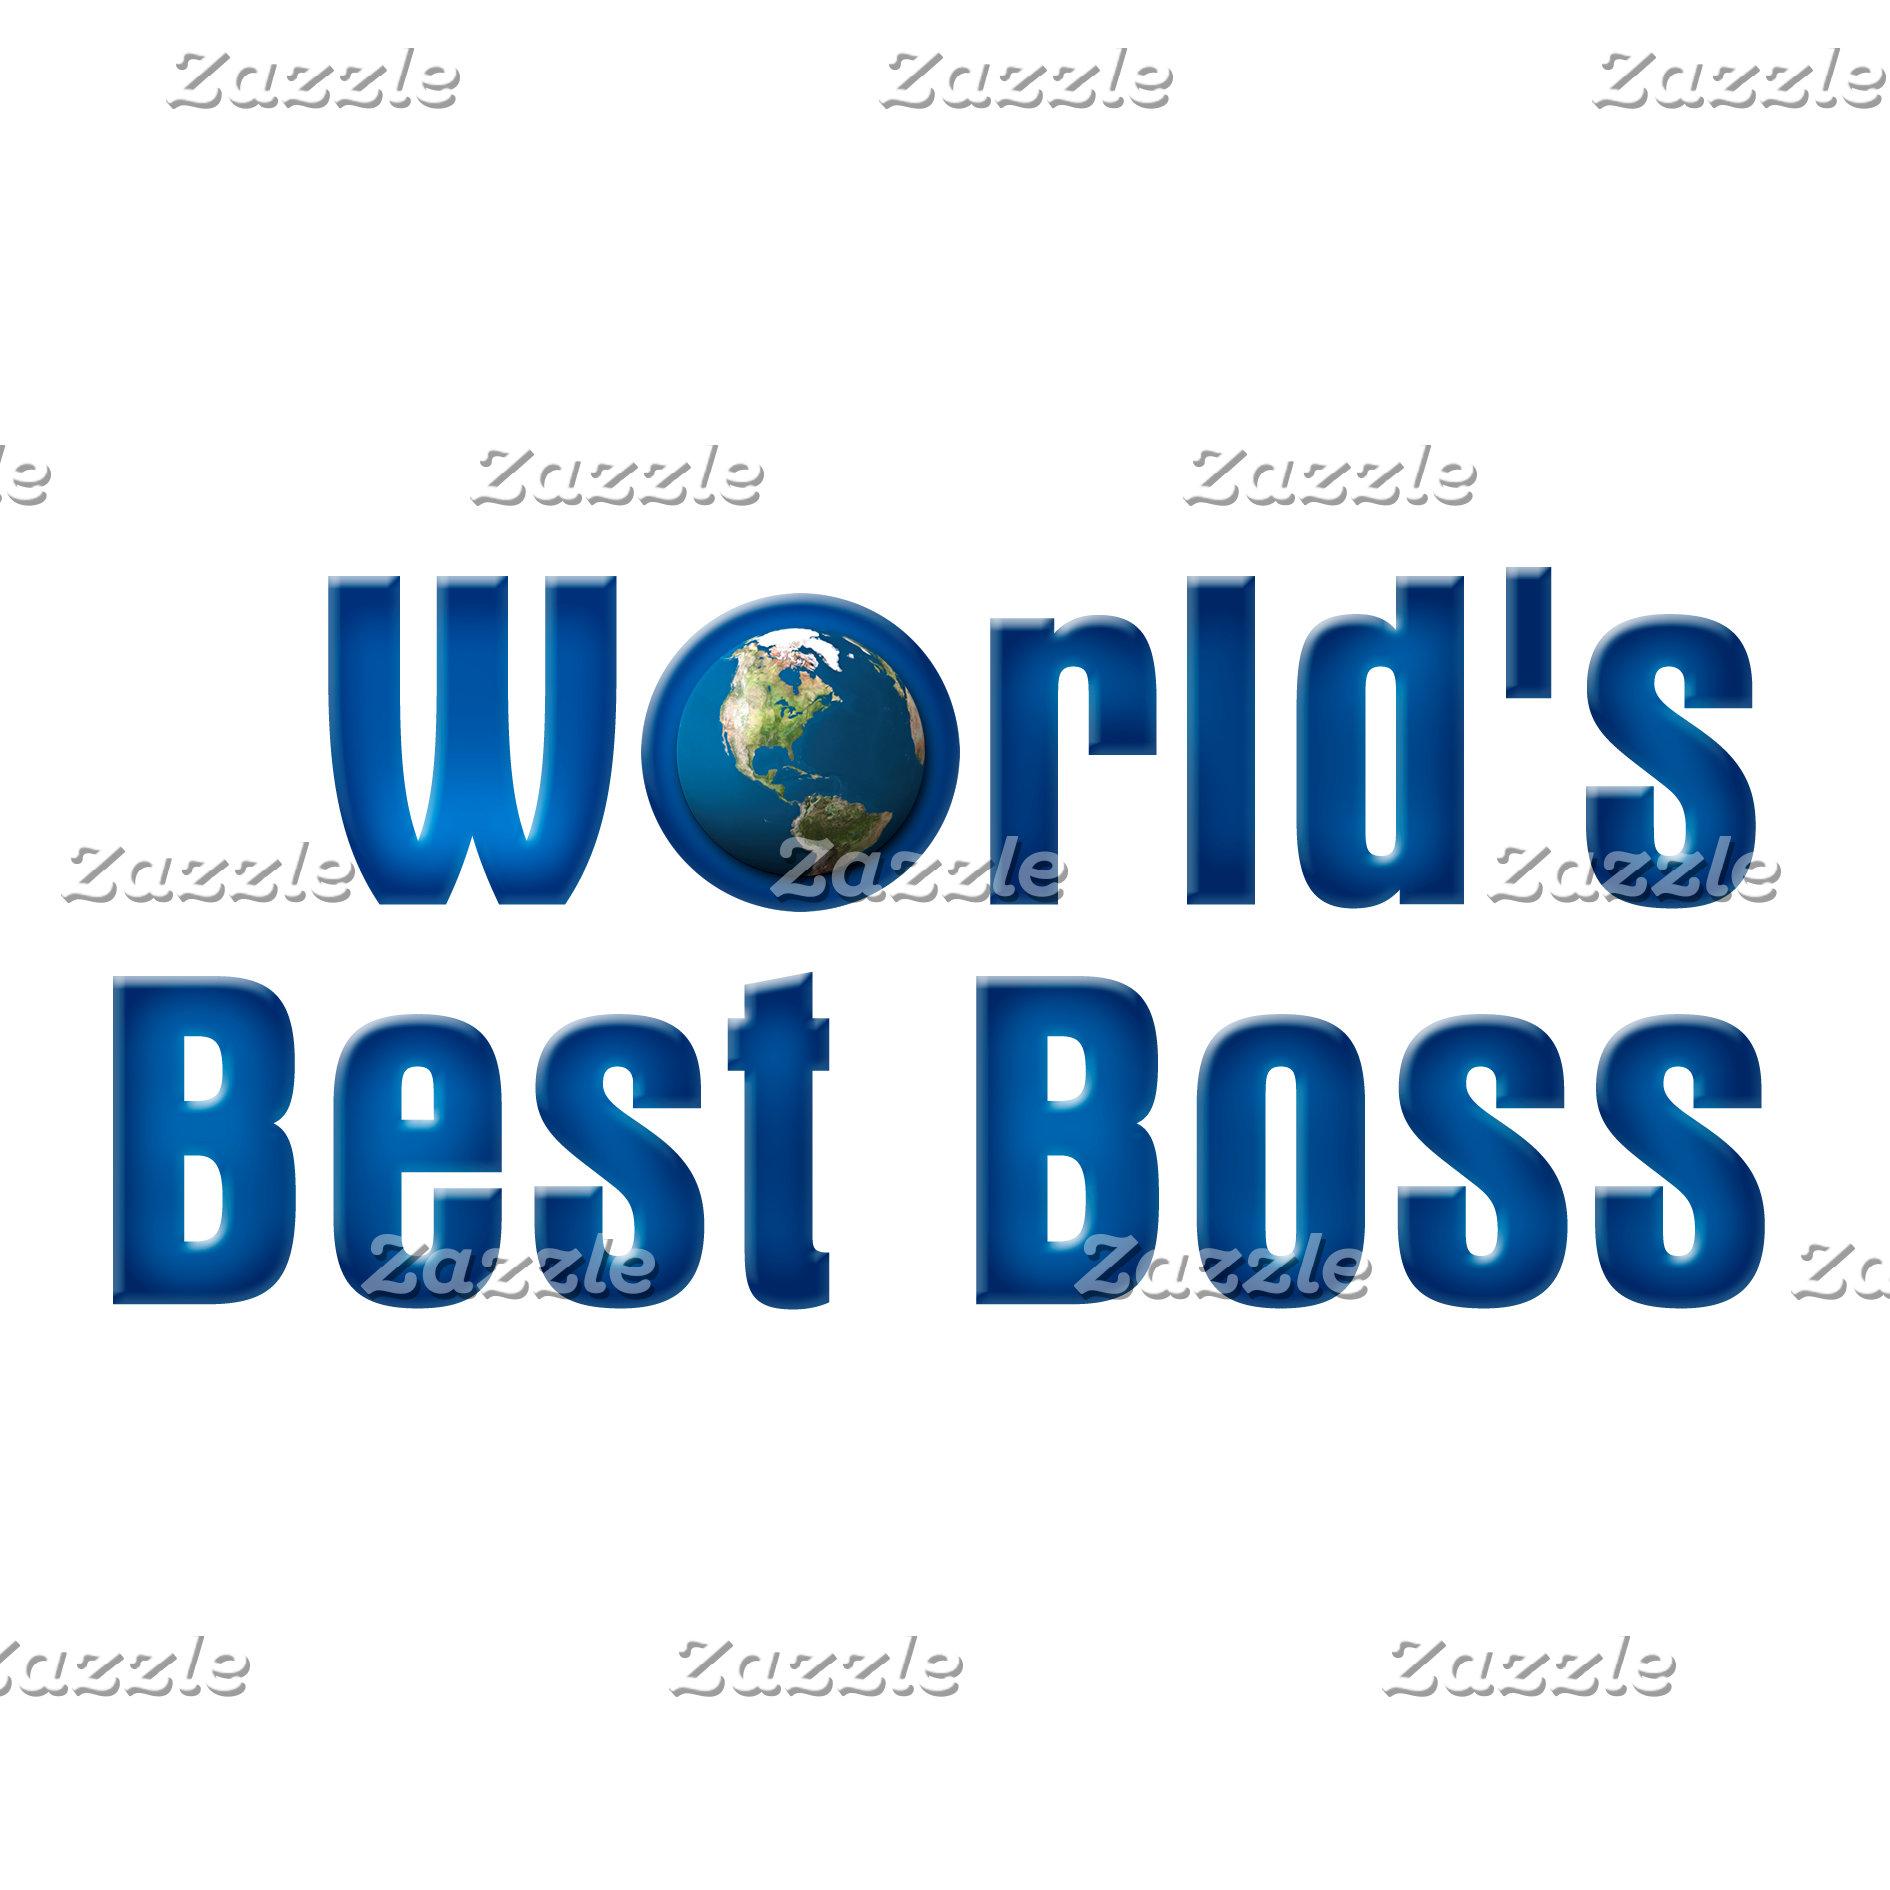 ► Best Boss